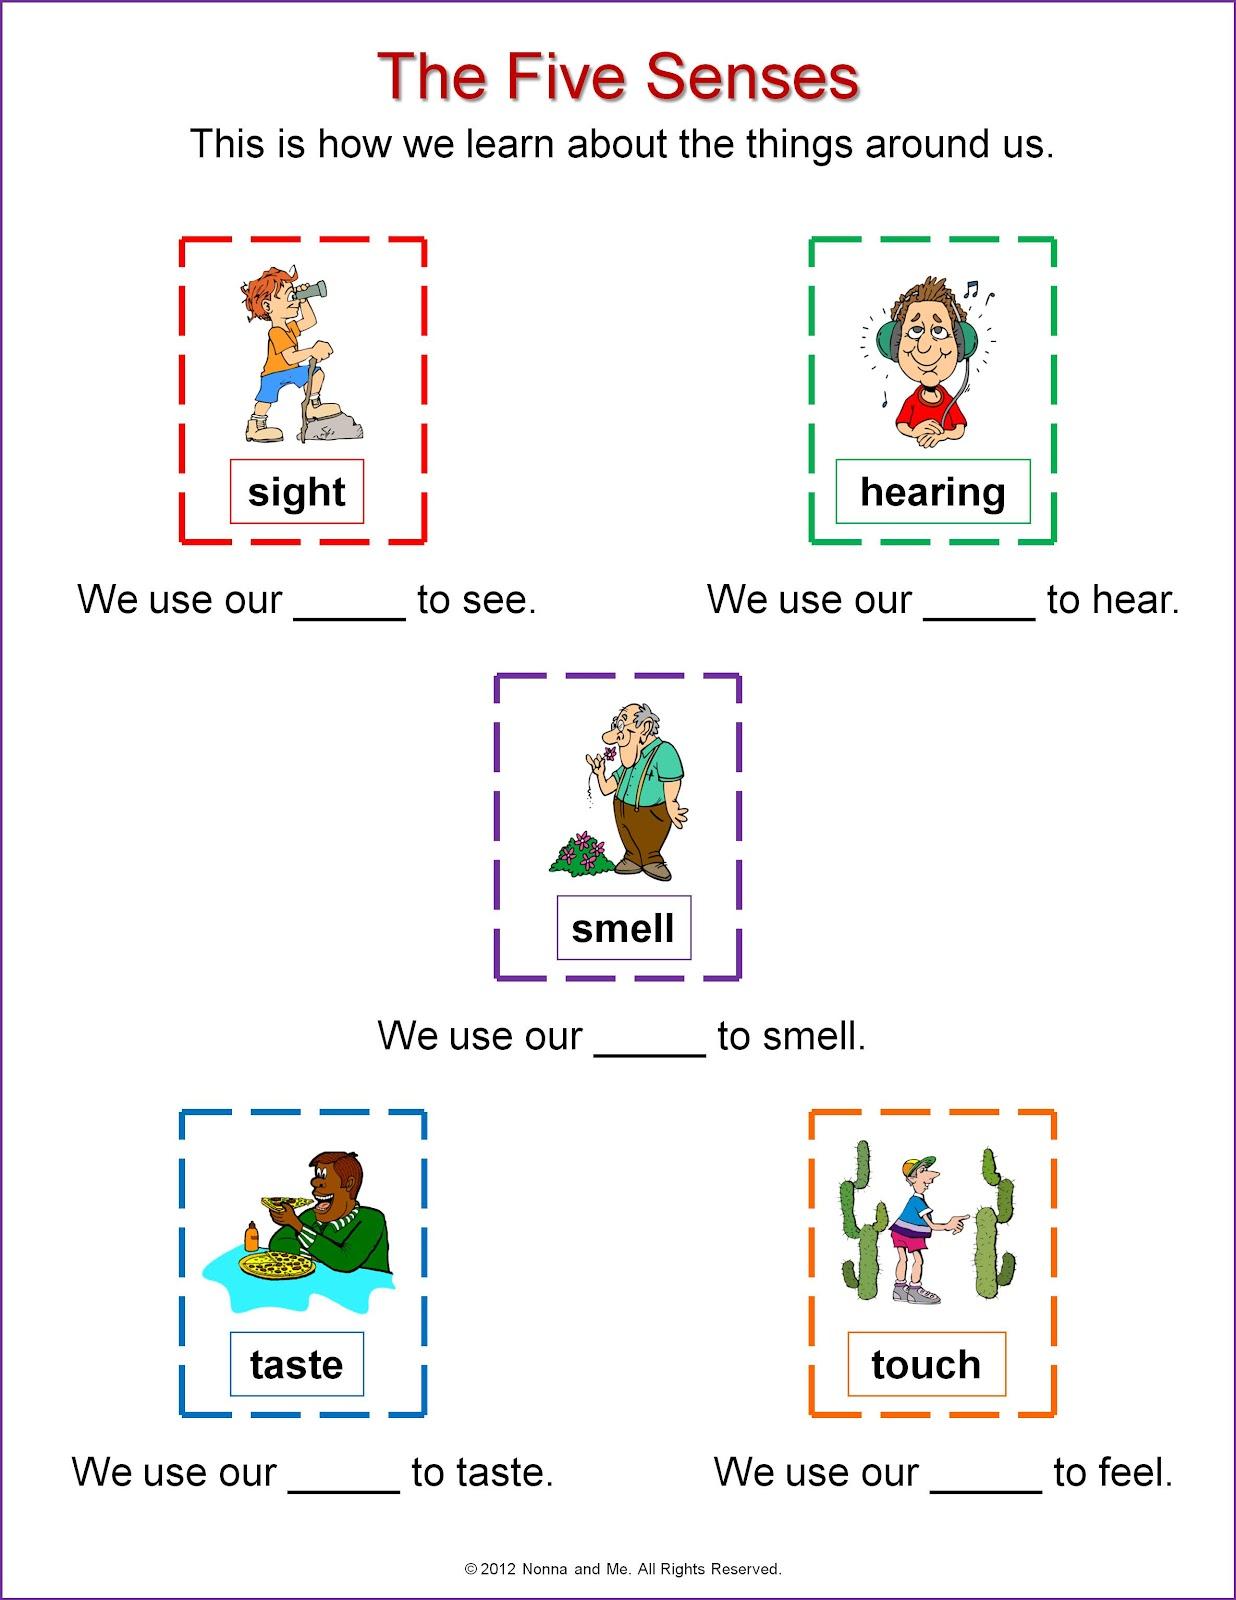 The Five Senses - Lessons - Tes Teach